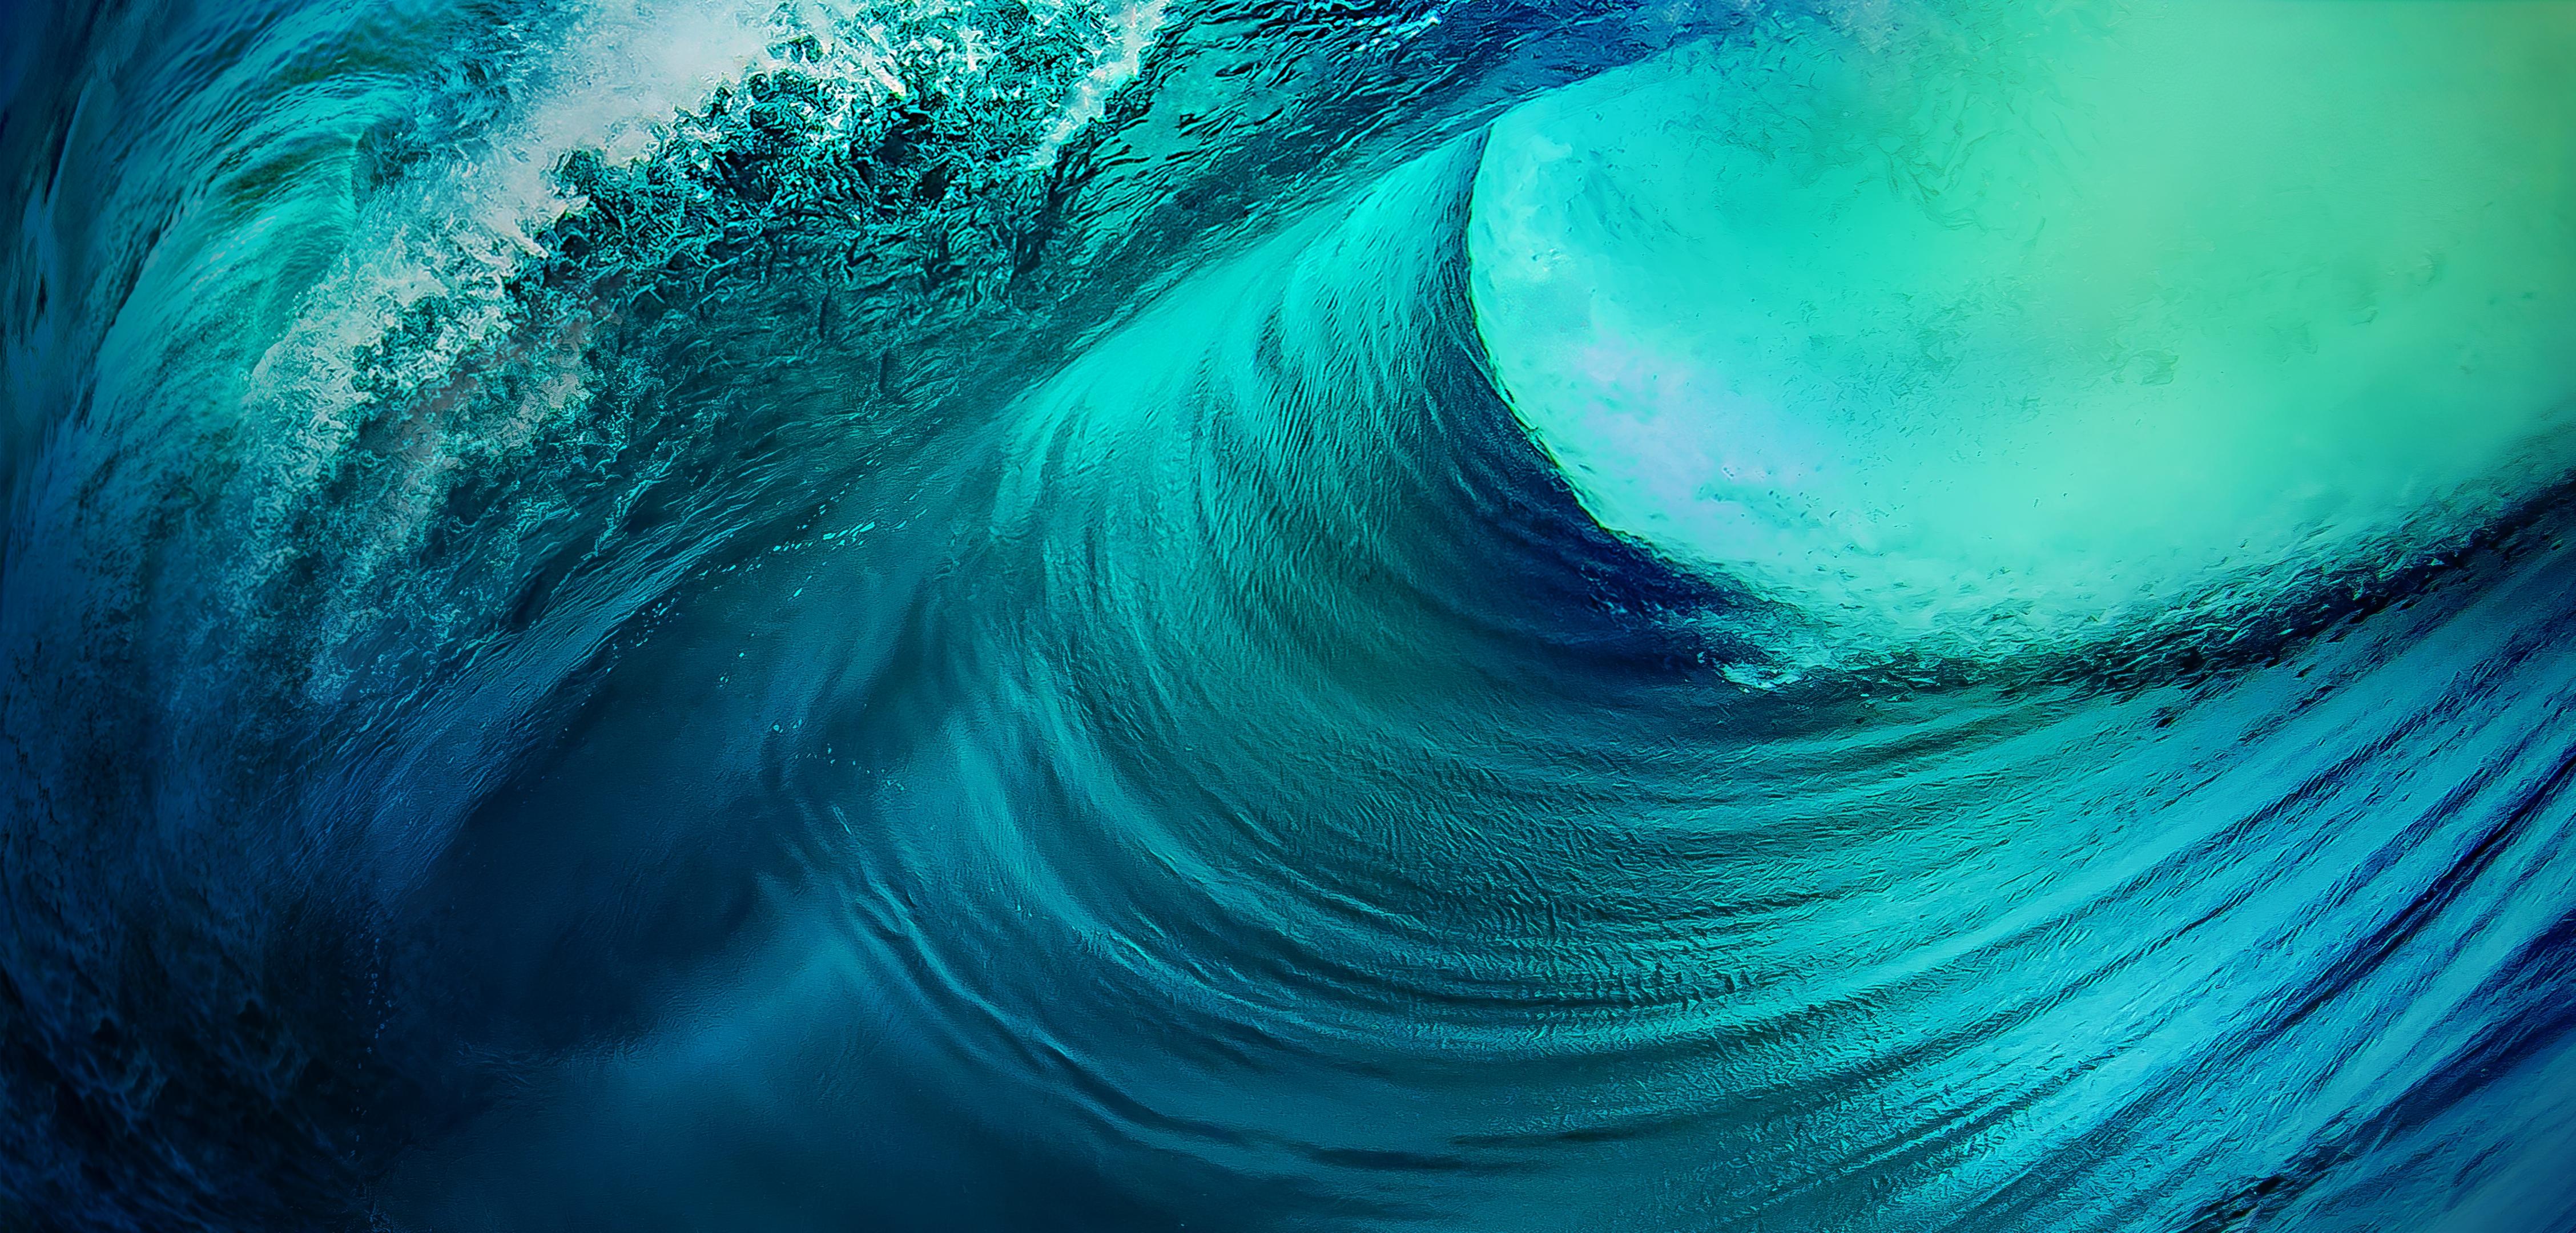 Ocean Waves 4k Wallpaper Stock Vivo Nex Android 10 Nature 481